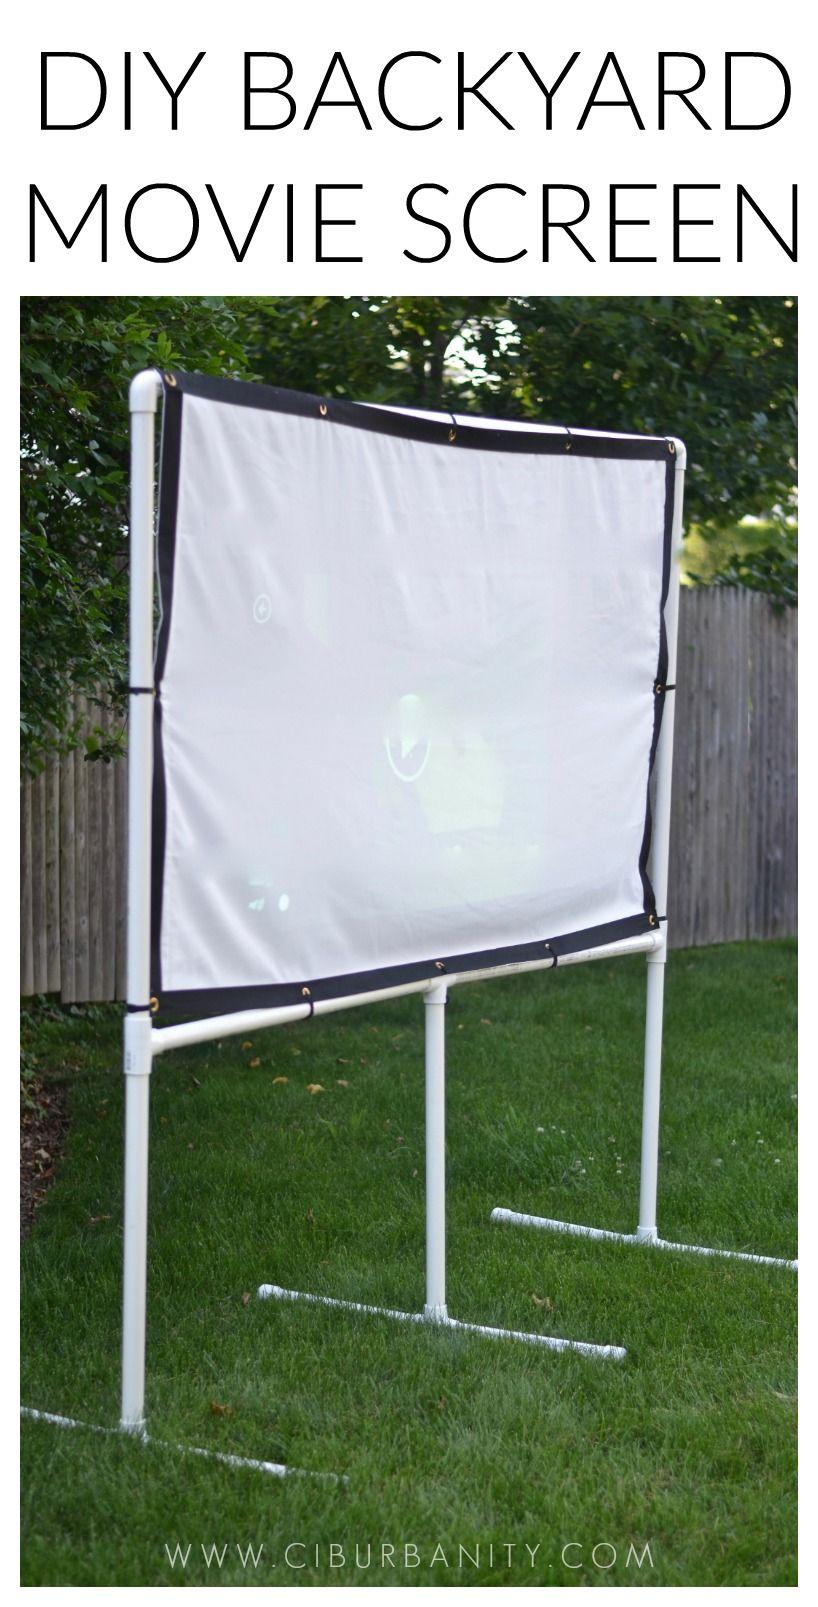 DIY Backyard Movie Screen   Extérieur, Jardins et Pvc